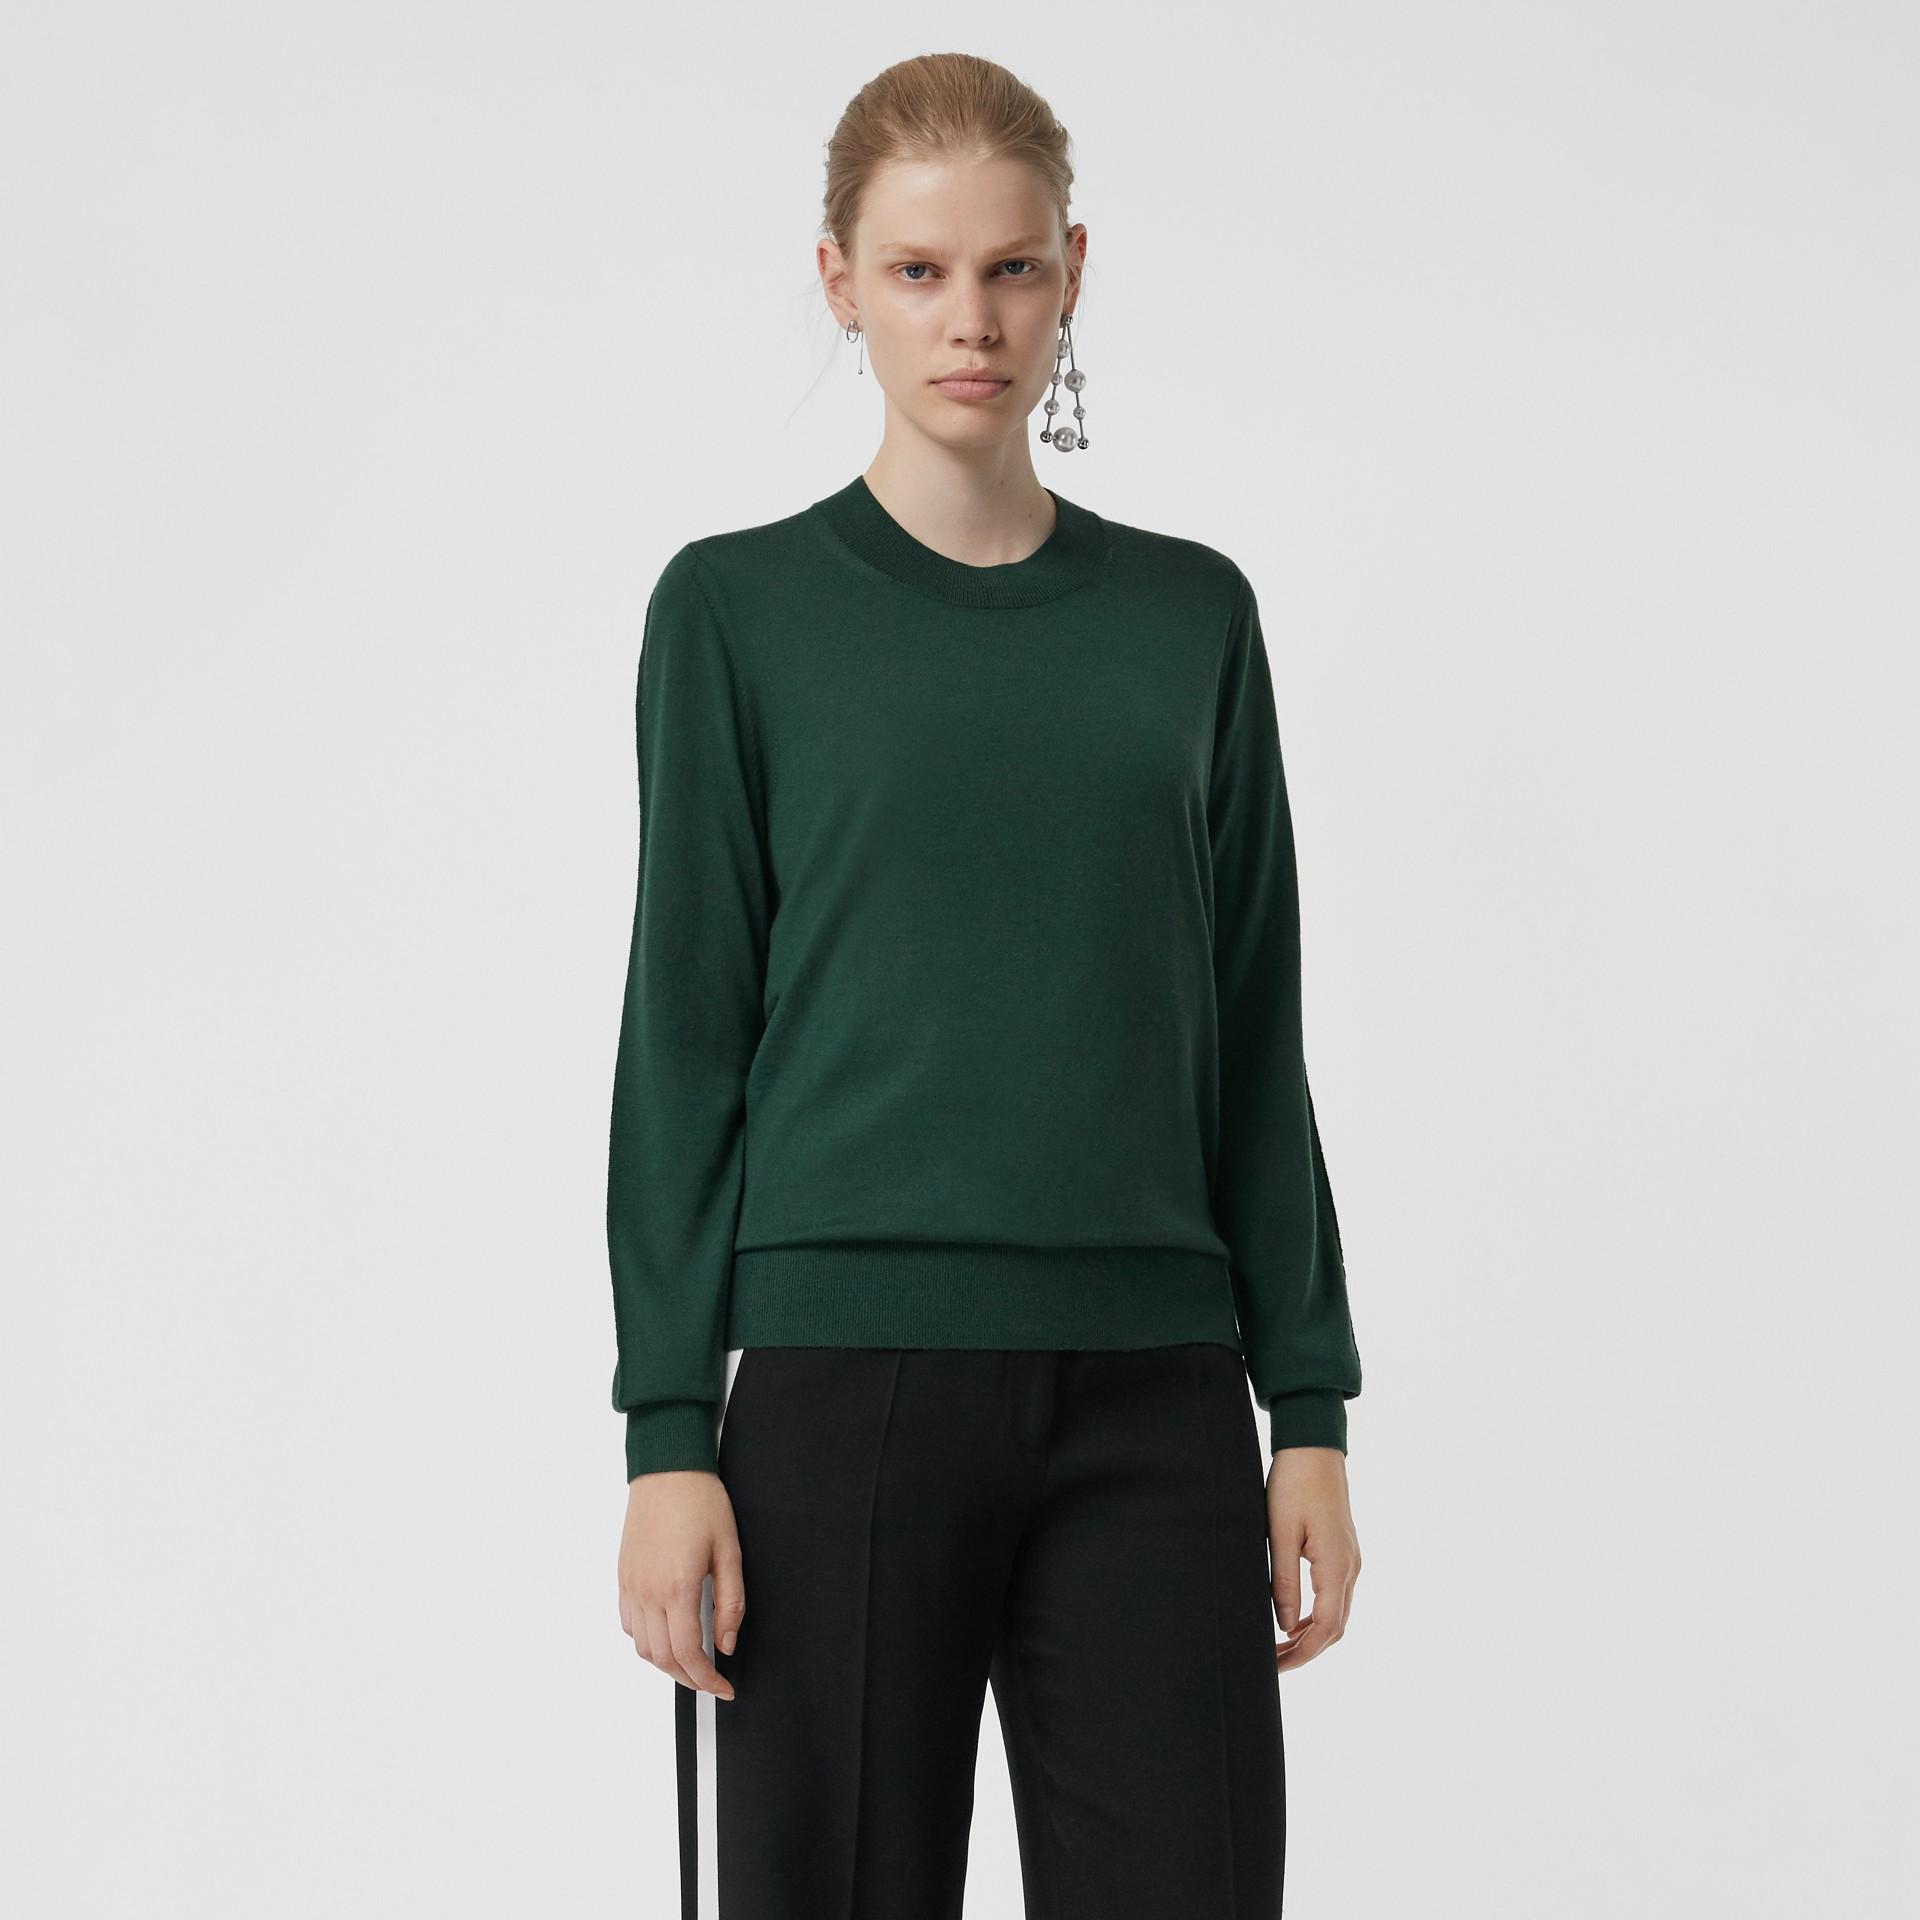 Merino Wool Crew Neck Sweater in Dark Forest Green - Women | Burberry Singapore - gallery image 4